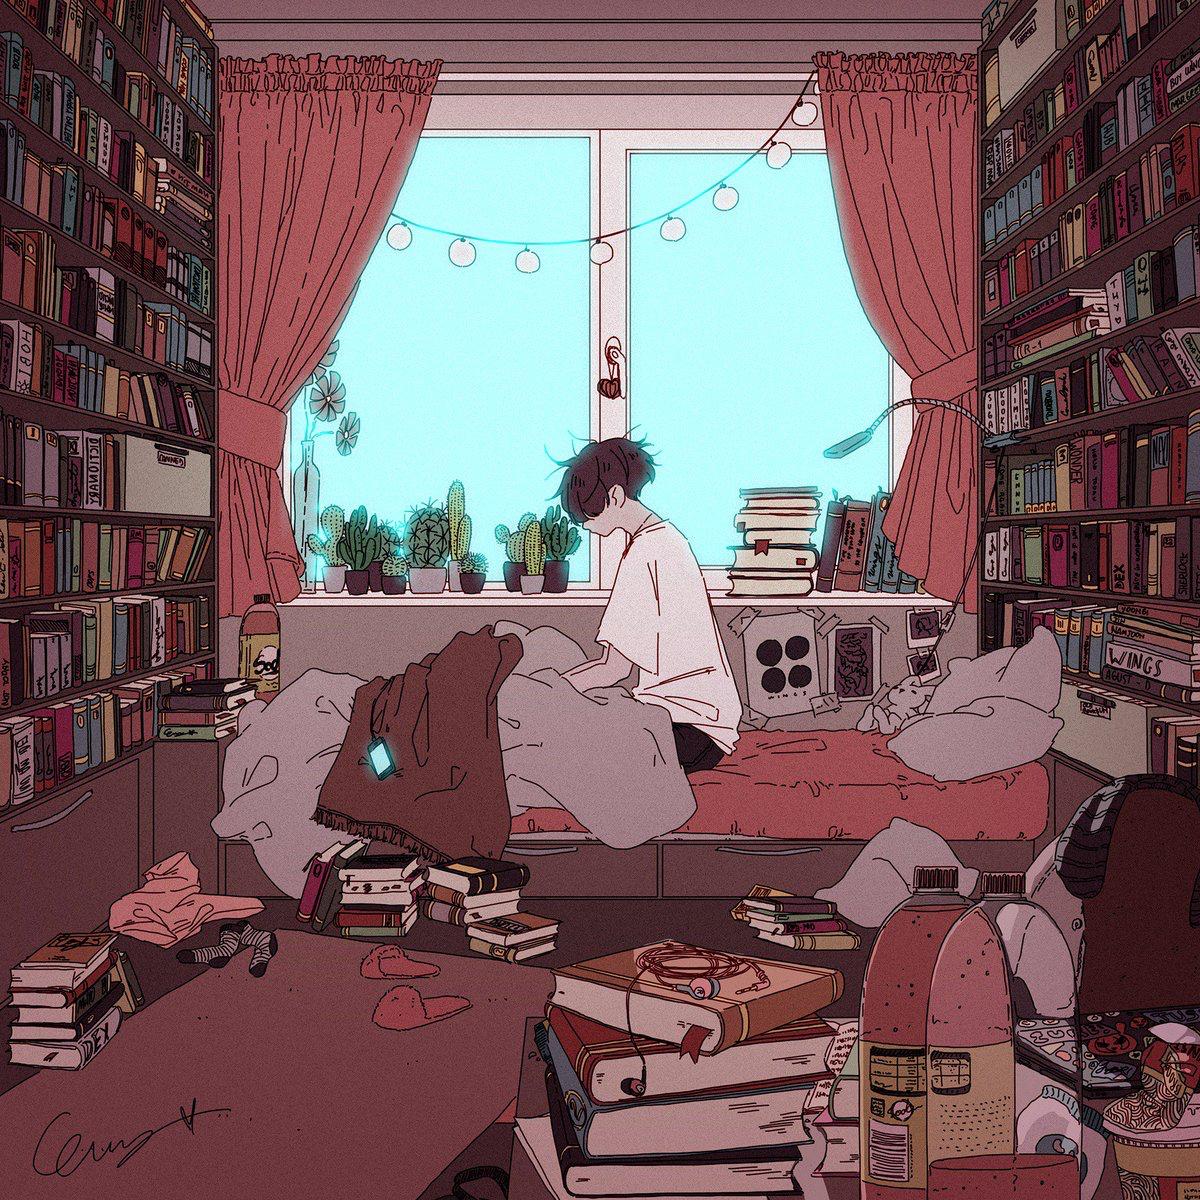 Aesthetic Anime Vibe Room Novocom Top